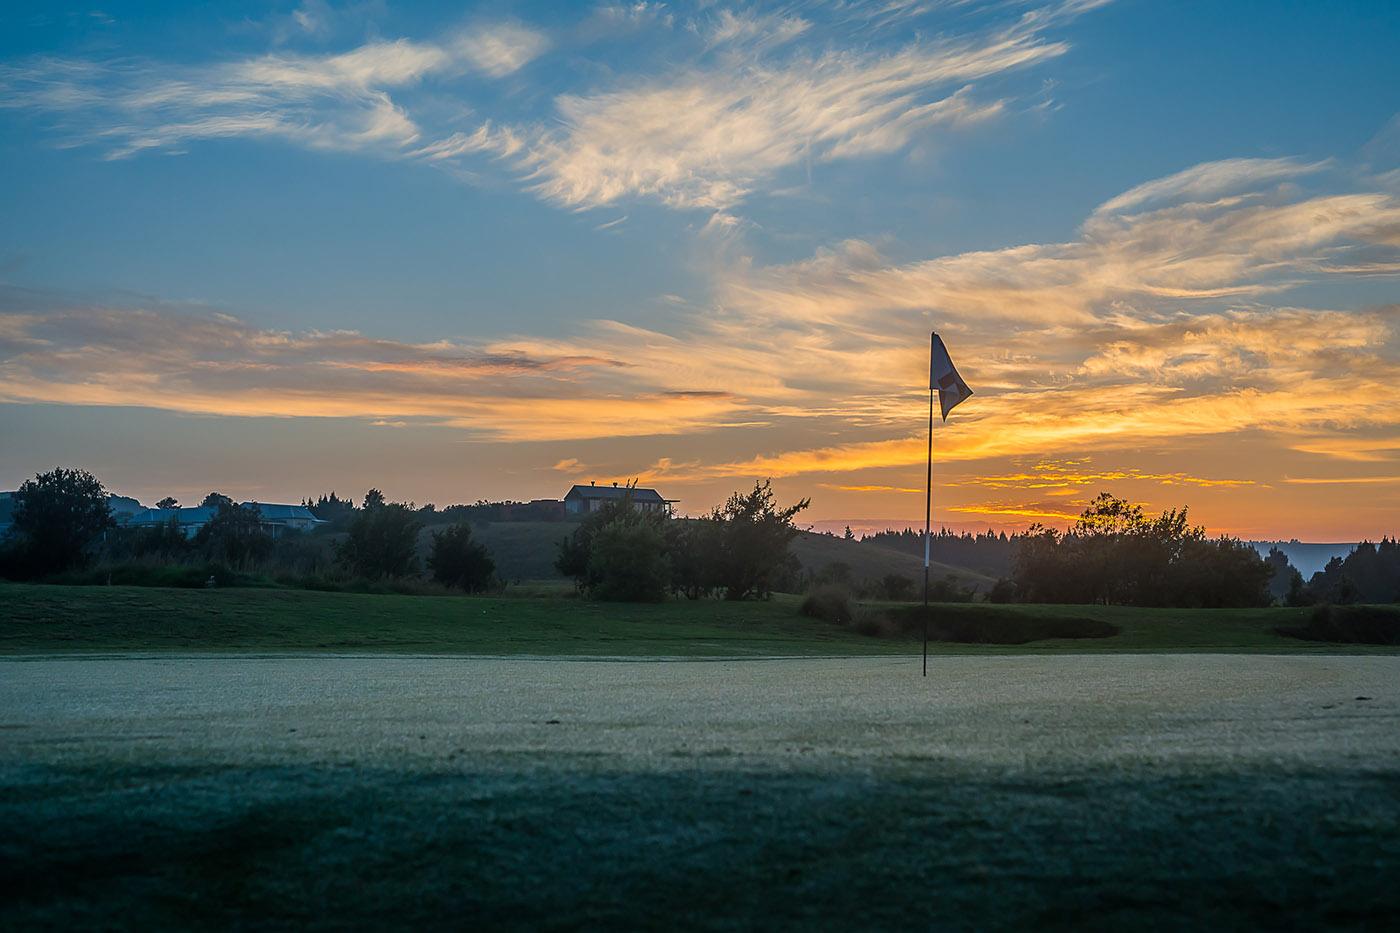 golf-gallery-gowrie-farm-trout-fishing-golf-estate-kwazulu-natal-midlands-Nottingham-Road